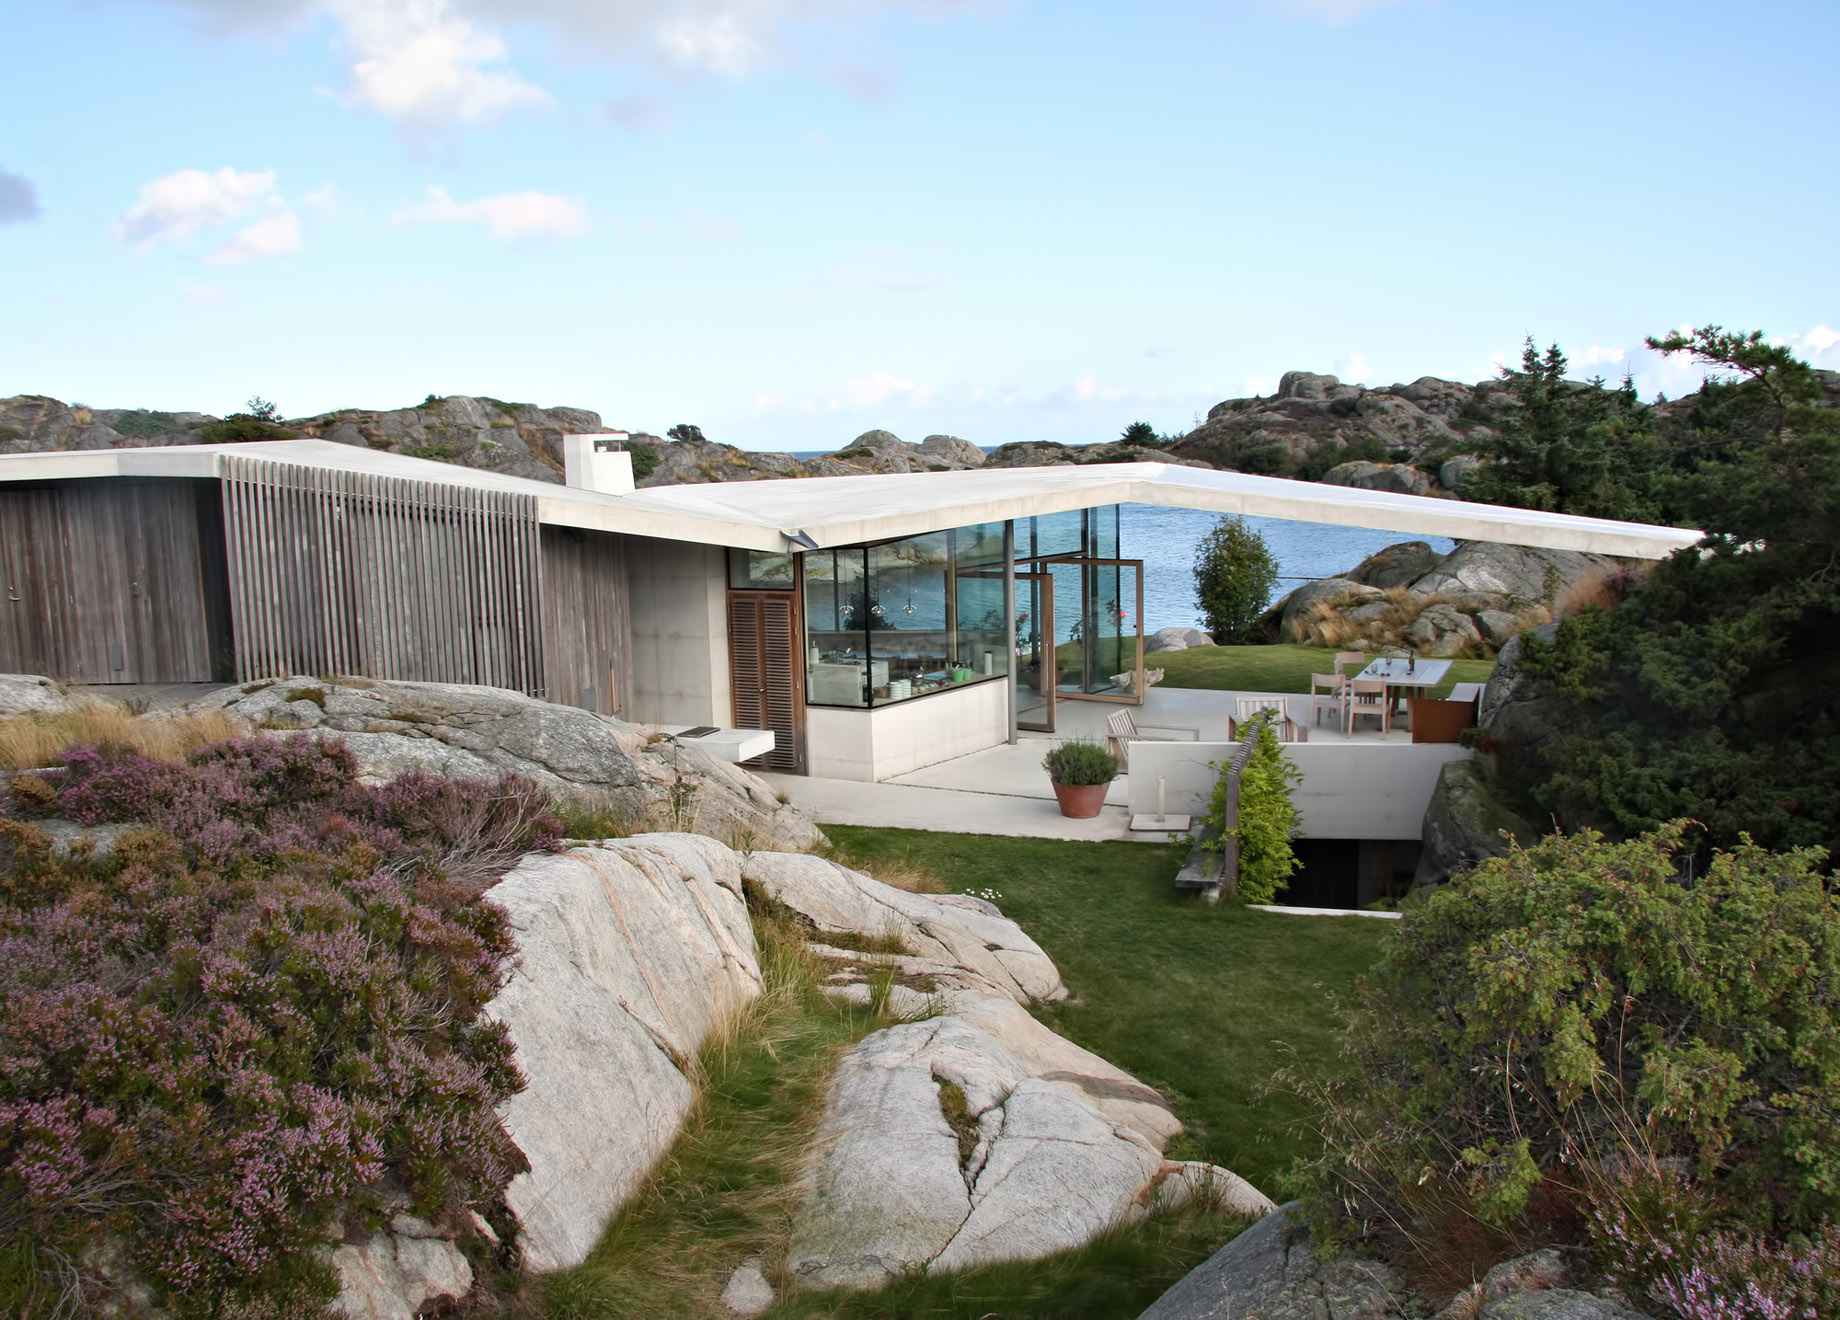 Lyngholmen Summer House – Lillesand, Agder, Norway